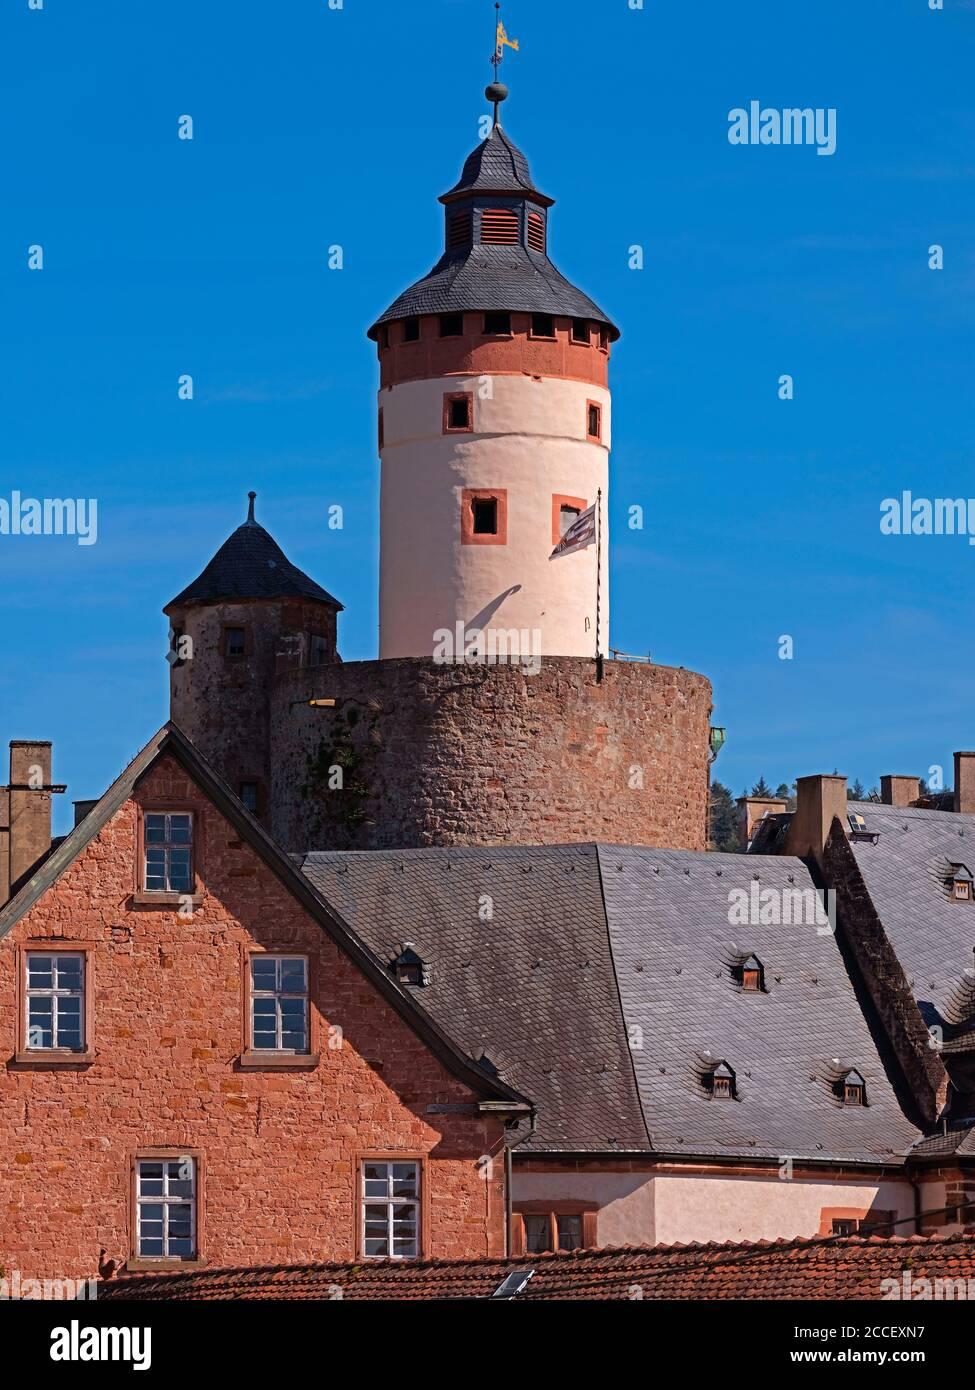 Büdinger Schloss, Bergfried, Grafschaft Ysenburg, Büdingen, Hessen, Germany Stock Photo